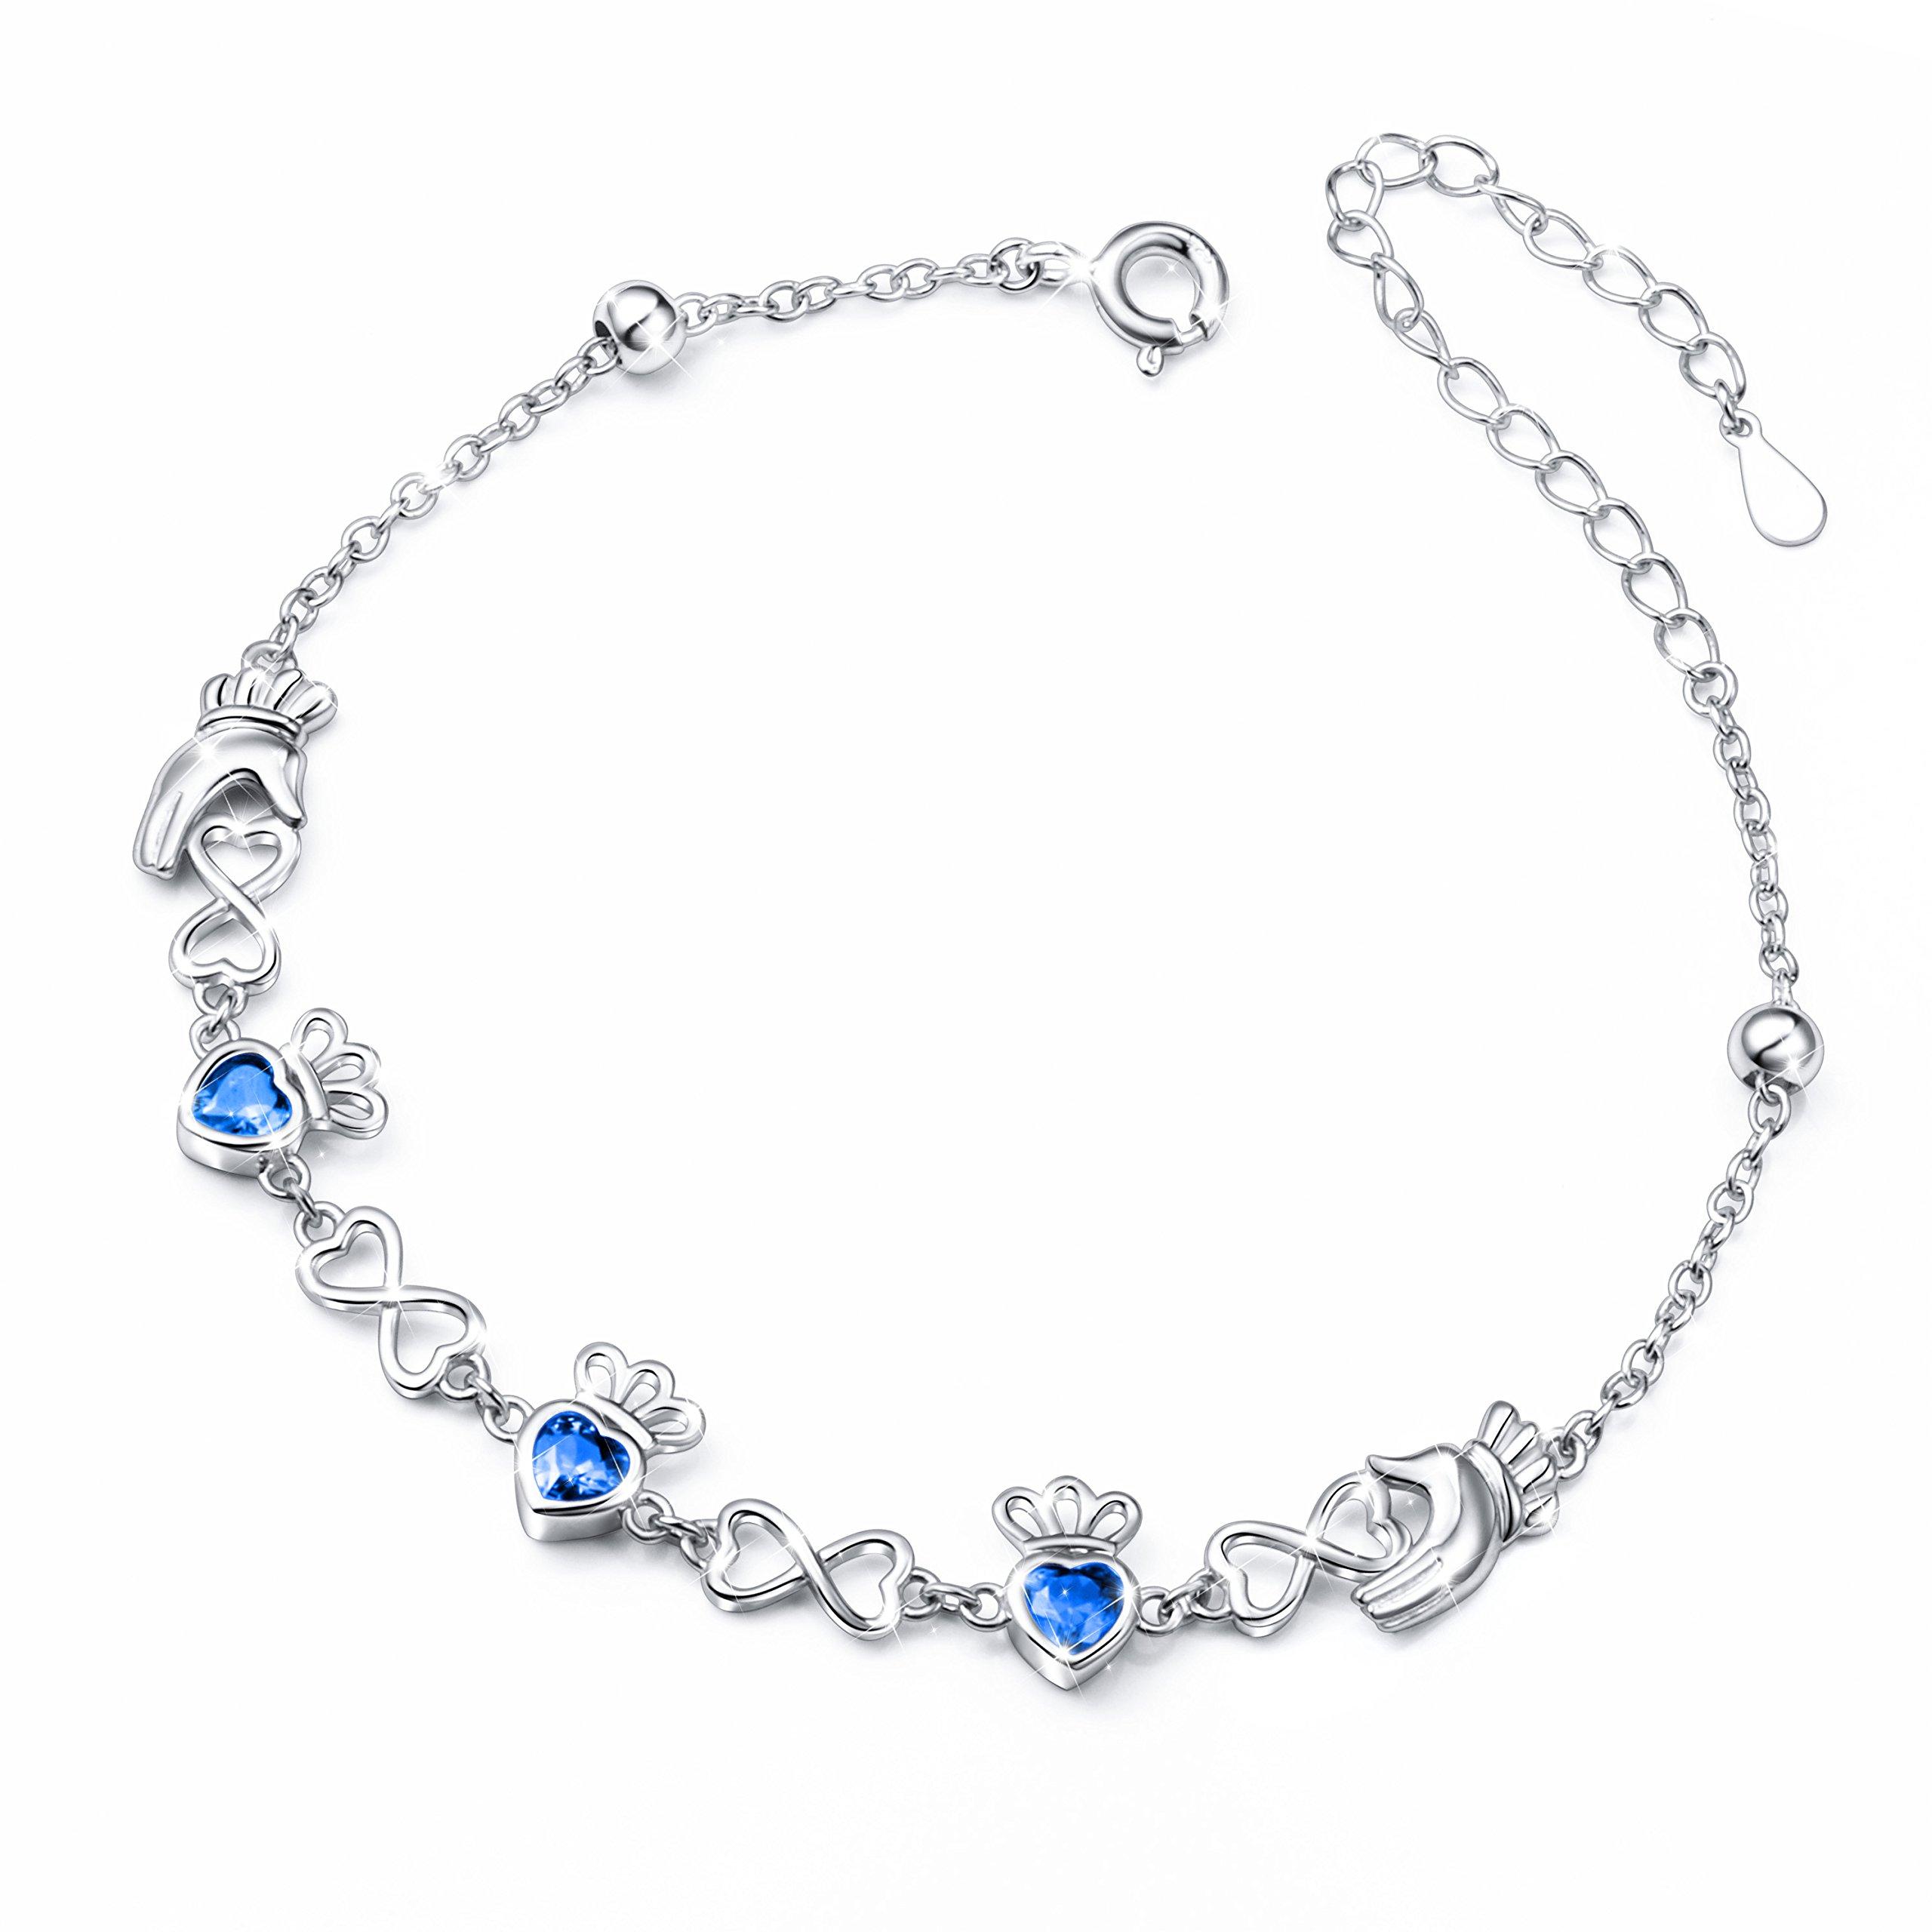 S925 Sterling Silver Adjustable Irish Celtic Claddagh Love Heart Bracelet for Women, 7''+2'' Extender (Blue)